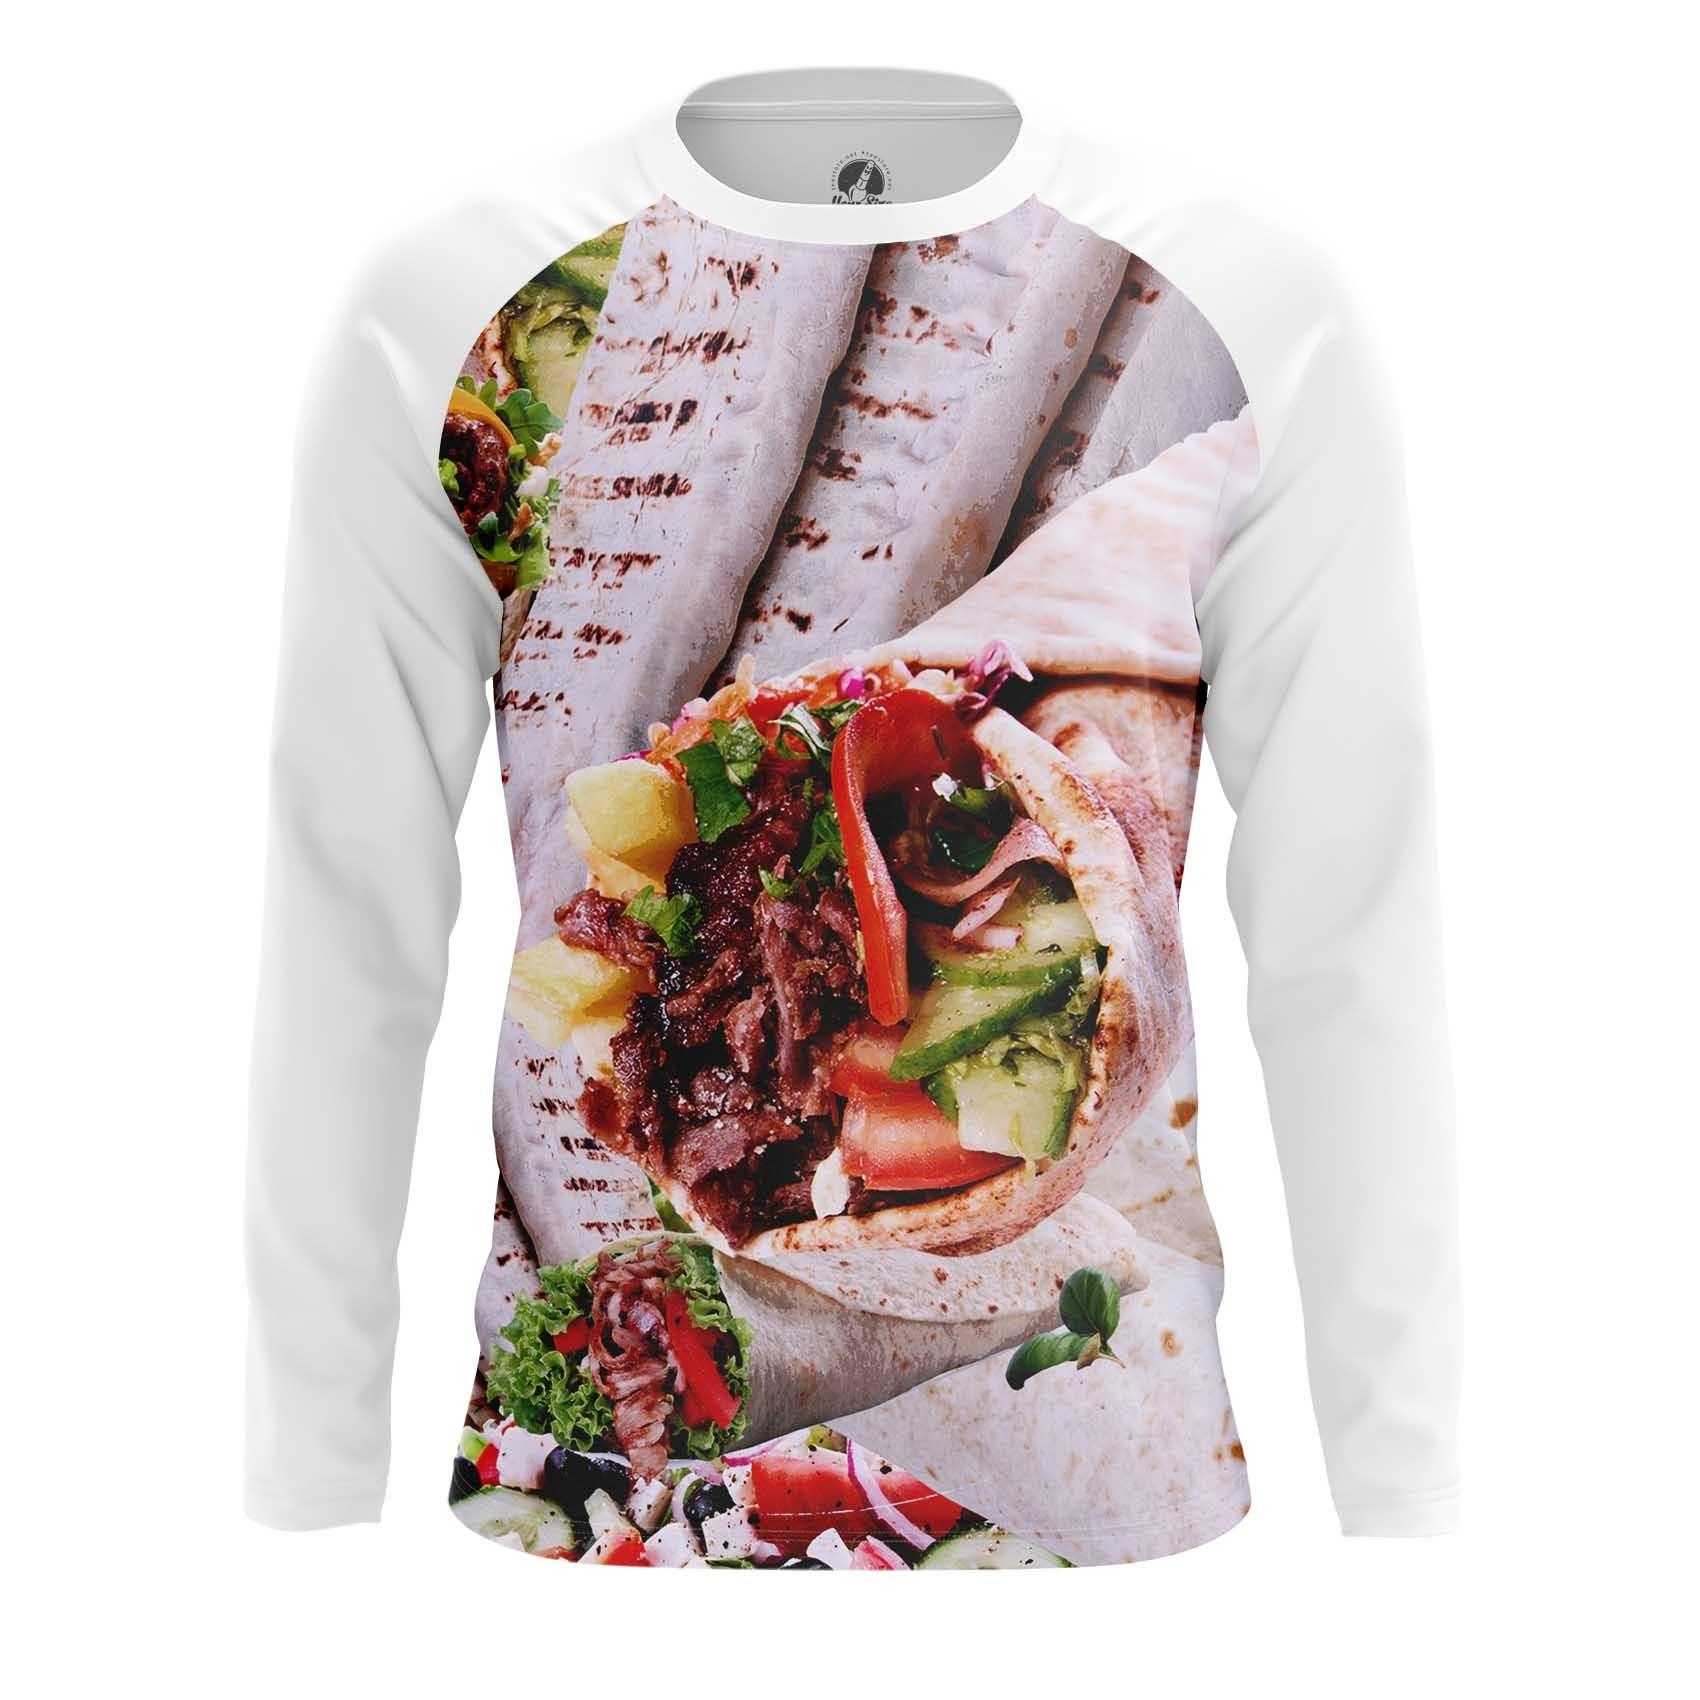 Collectibles Long Sleeve Shawarma Food Art Fun Apperel Meat